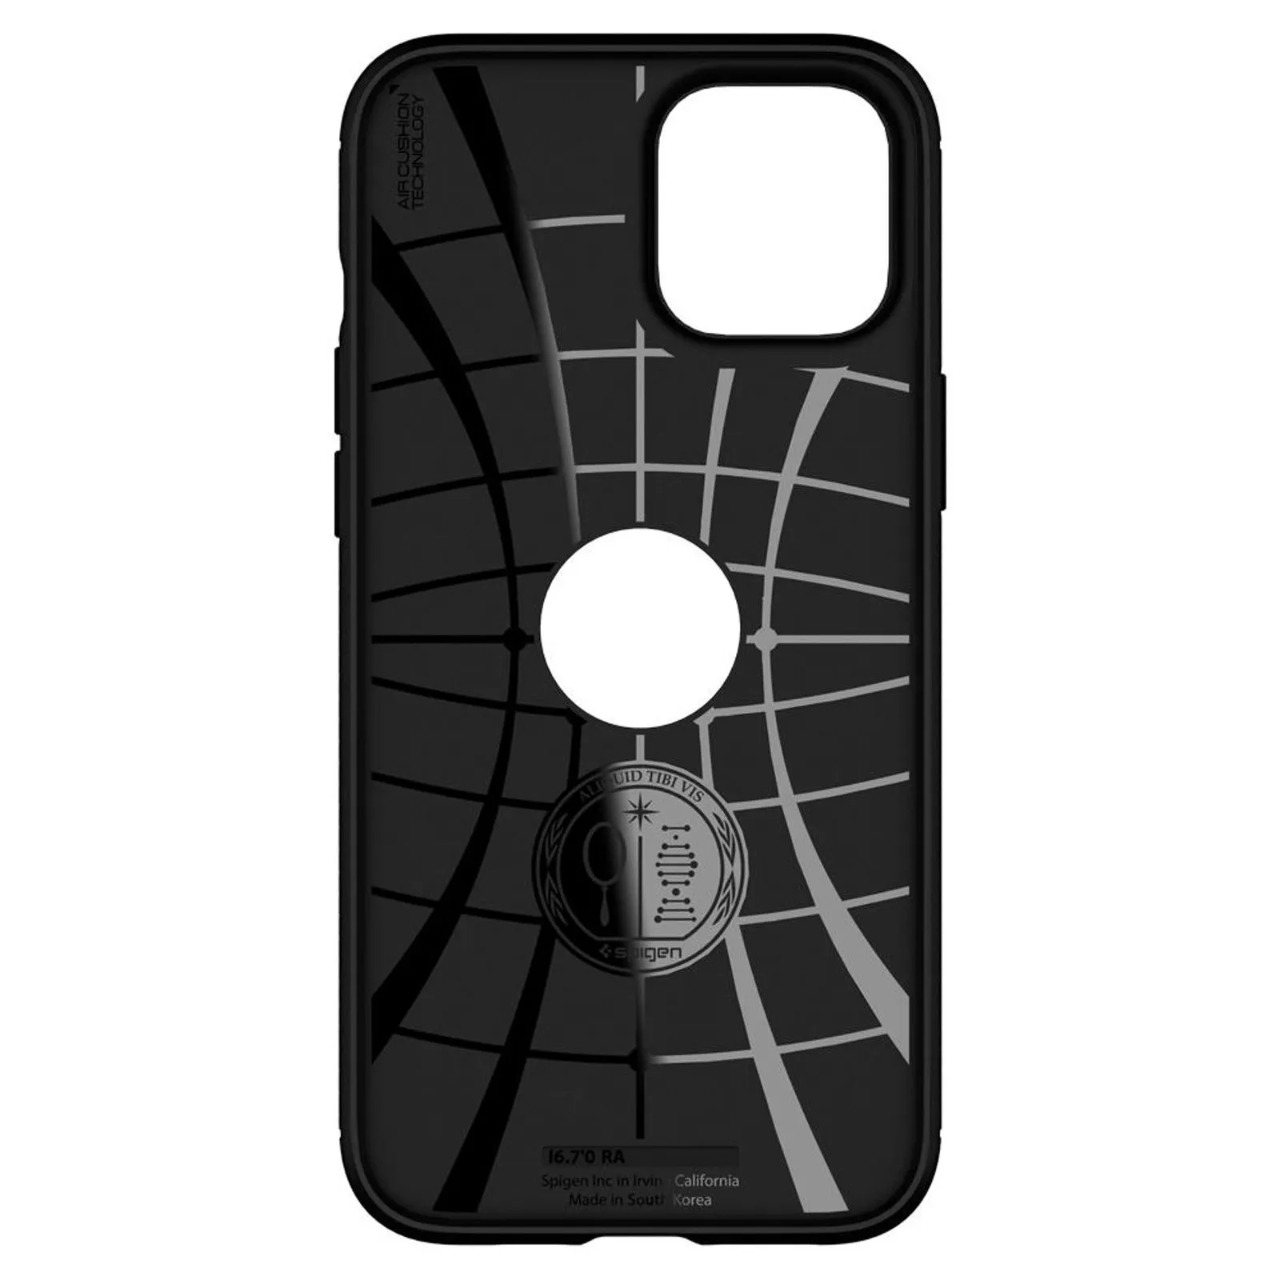 Capa Rugged Armor Matte Black Compatível com iPhone 12 Pro Max